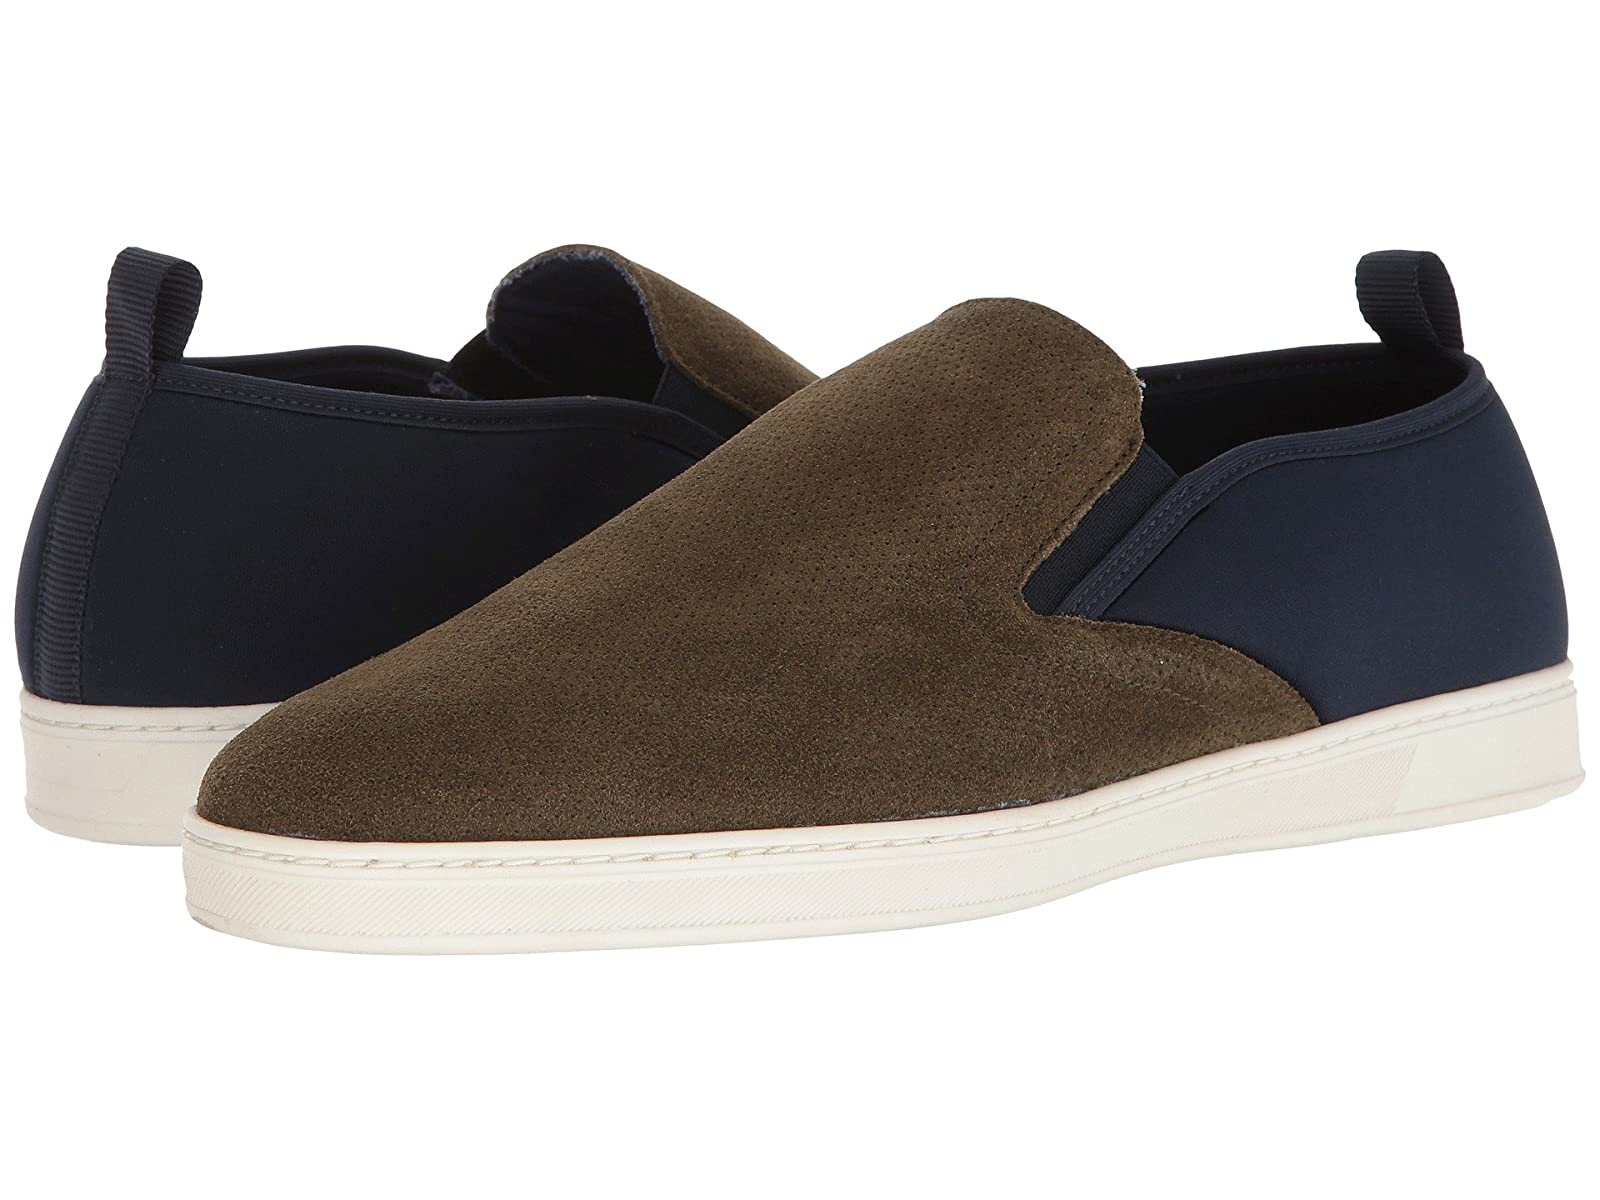 PARC City Boot PierCheap and distinctive eye-catching shoes